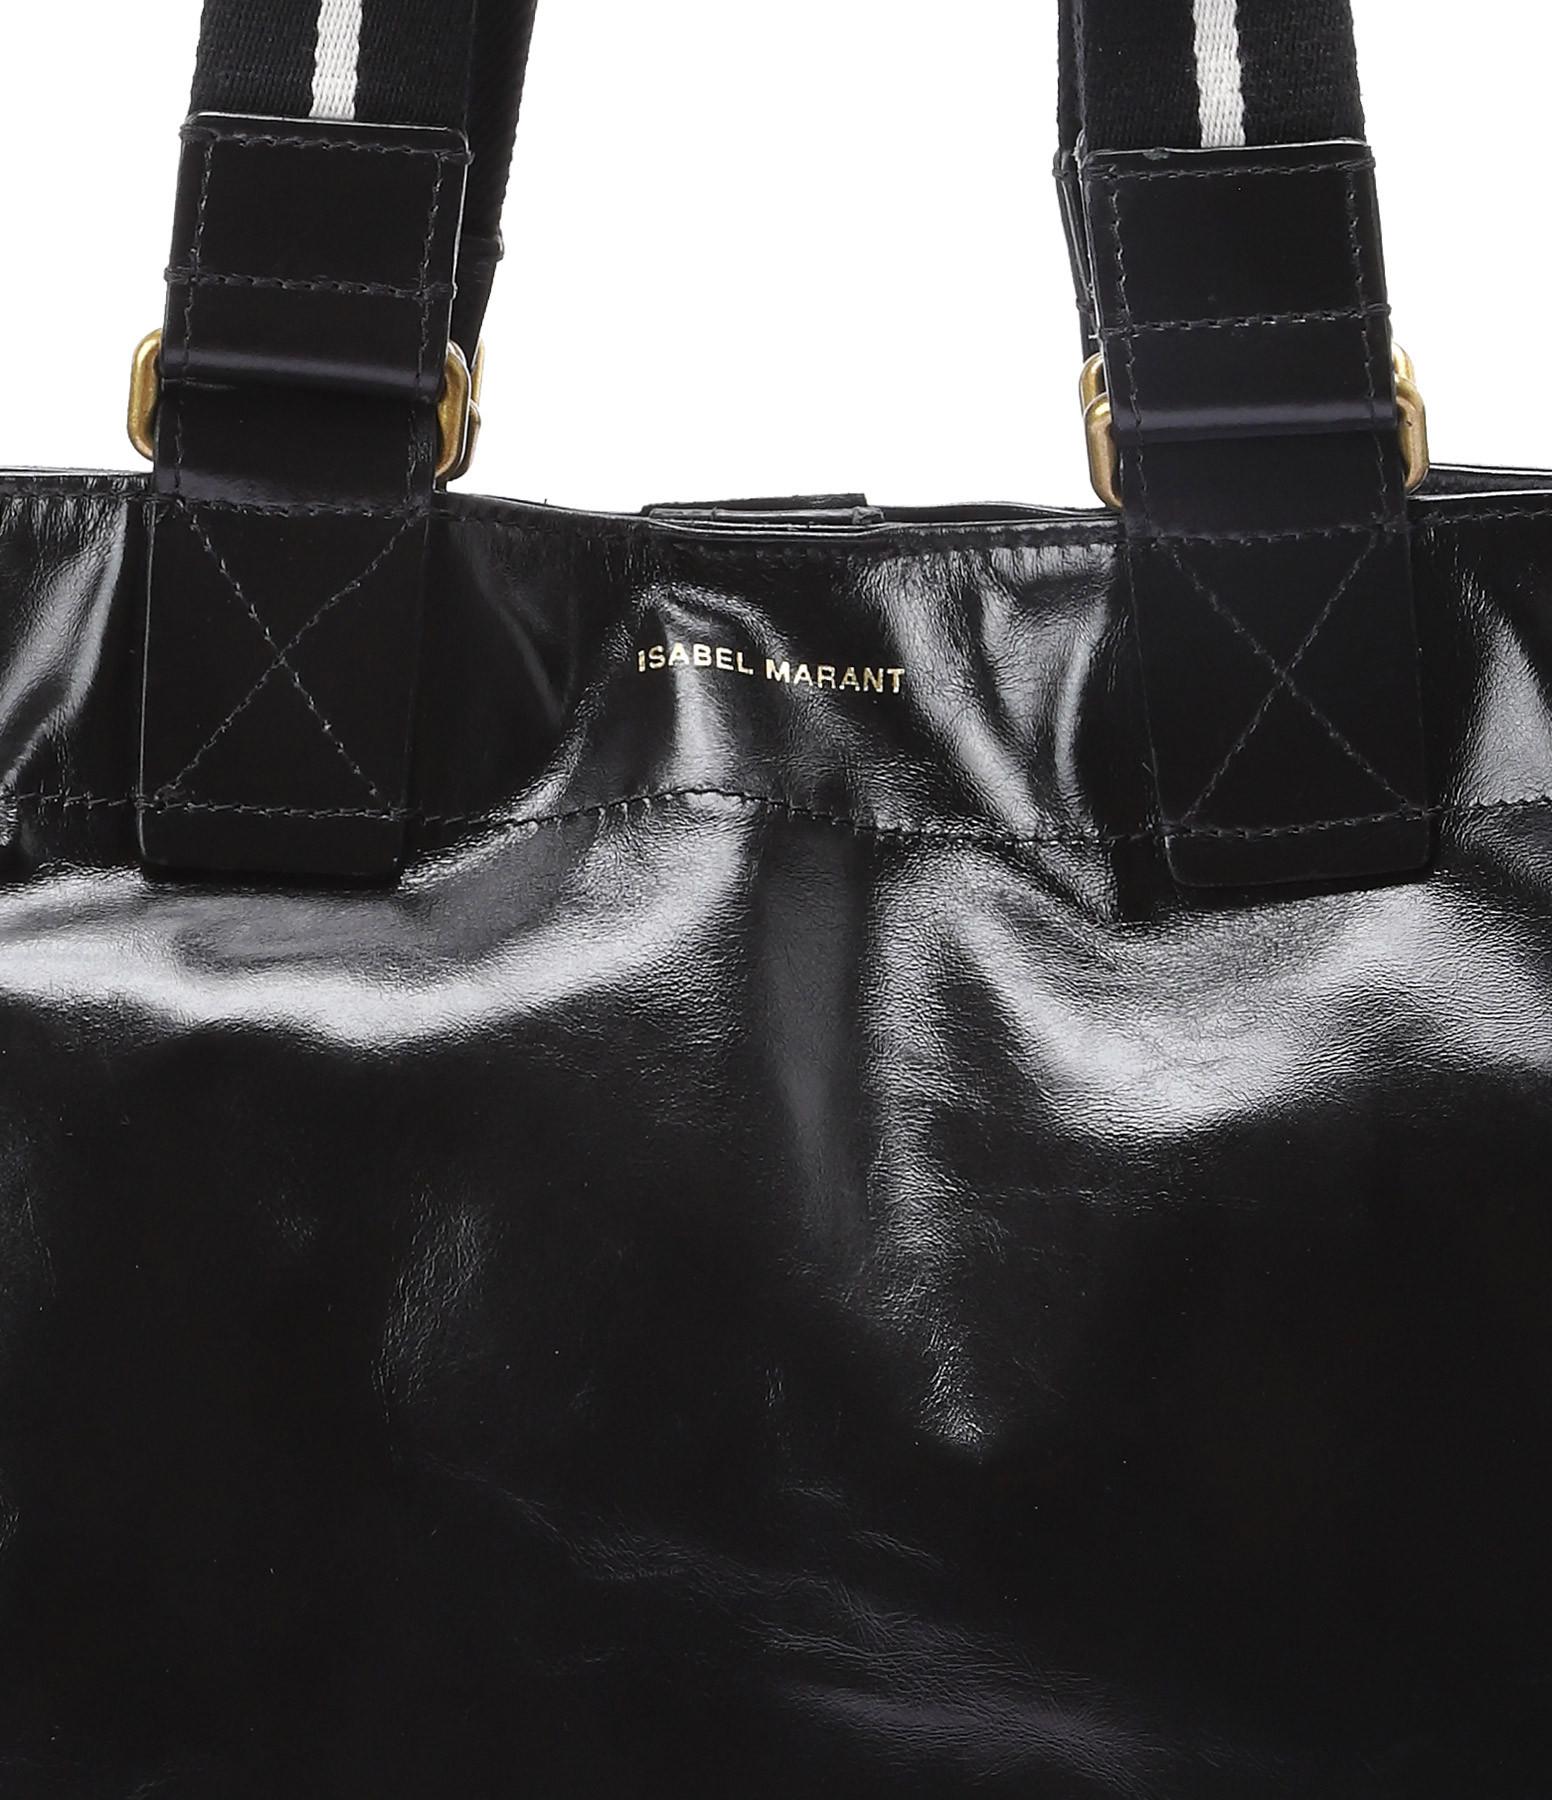 ISABEL MARANT ETOILE - Sac Bagya New Cuir Noir